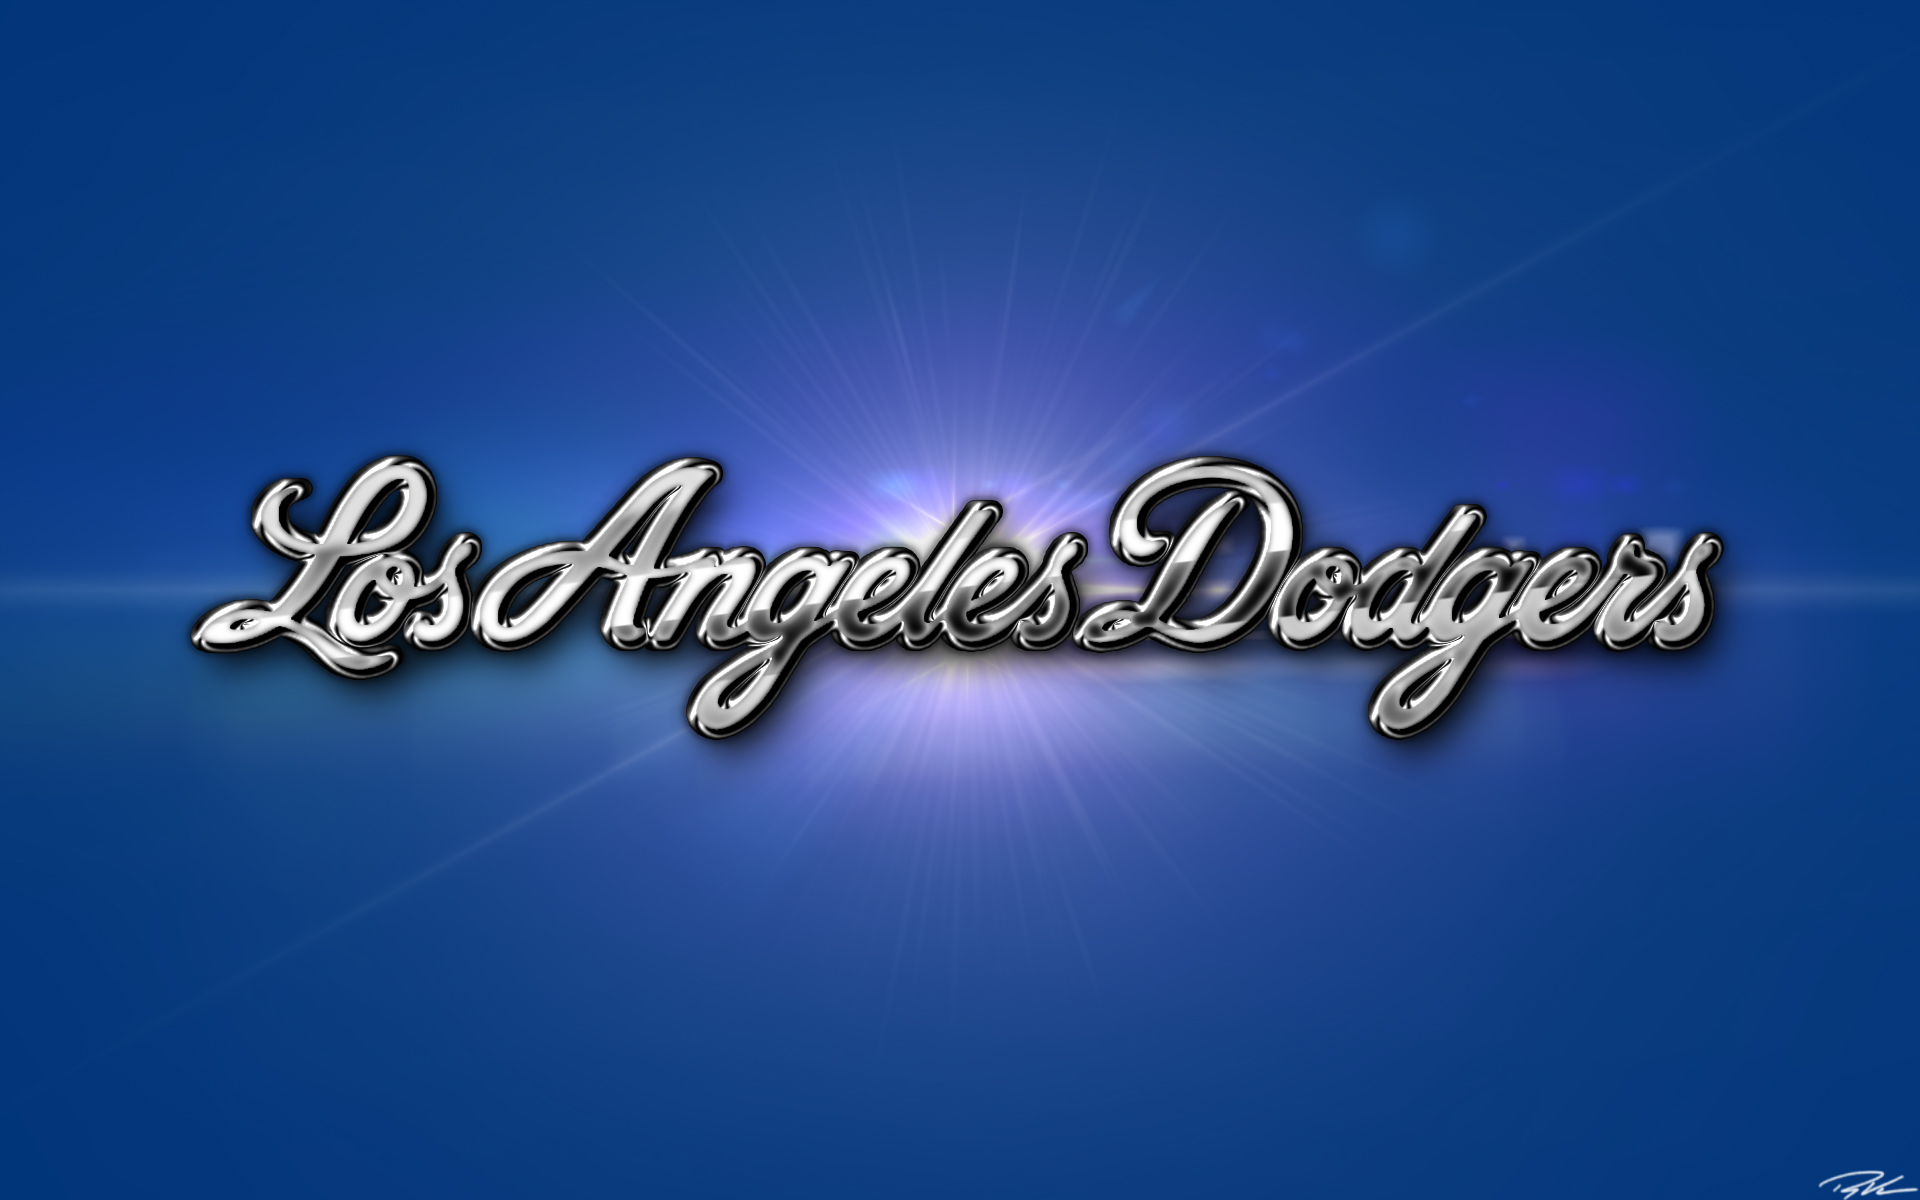 LOS ANGELES DODGERS baseball mlb y wallpaper 1920x1200 158579 1920x1200